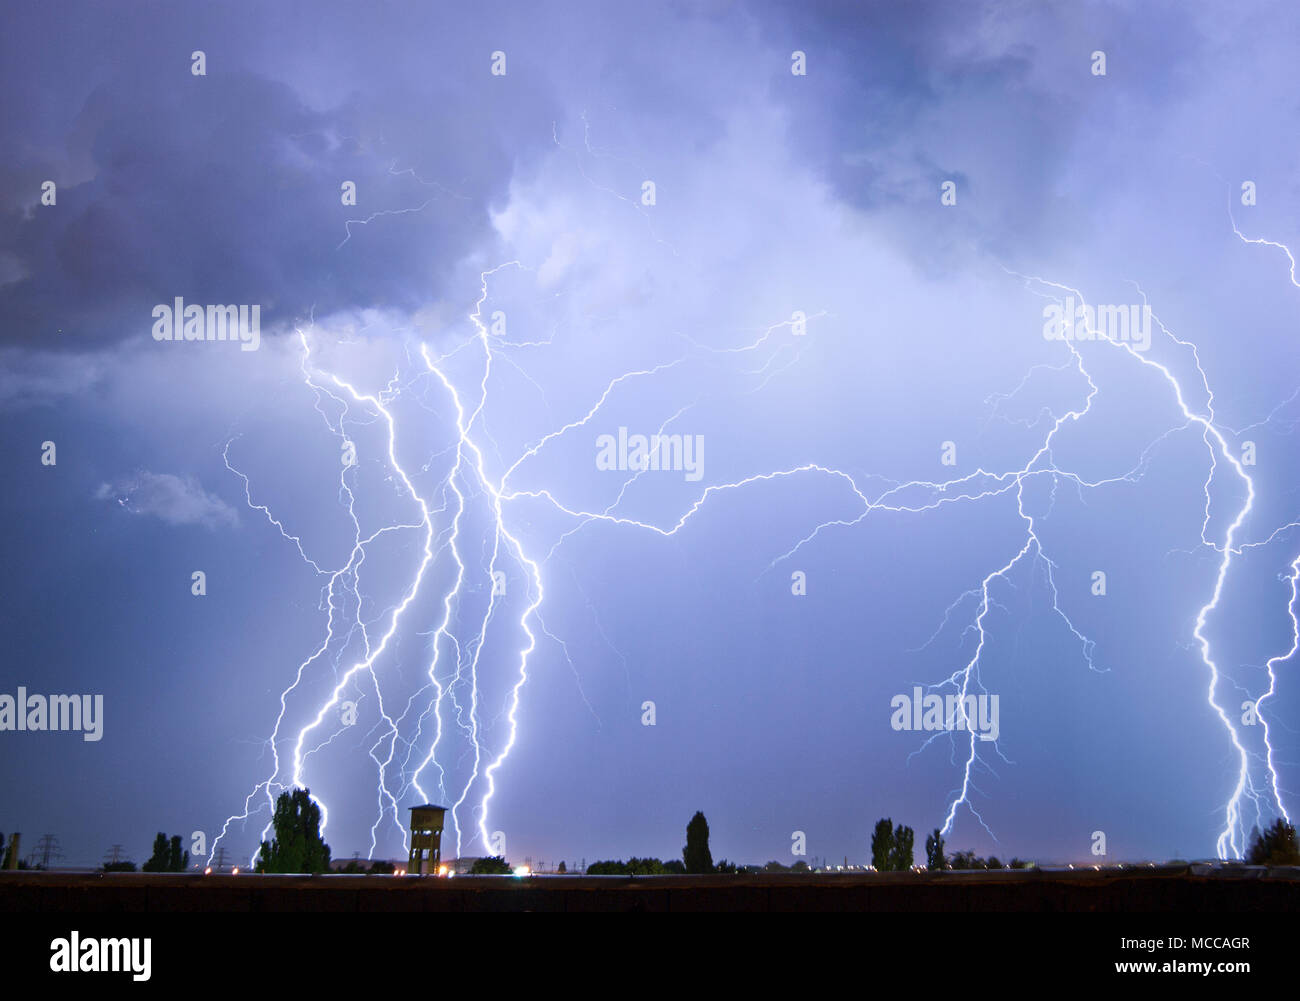 Lightning flash over a city, Thunderstorm , electricity blast storm, thunderbolt in sky Stock Photo